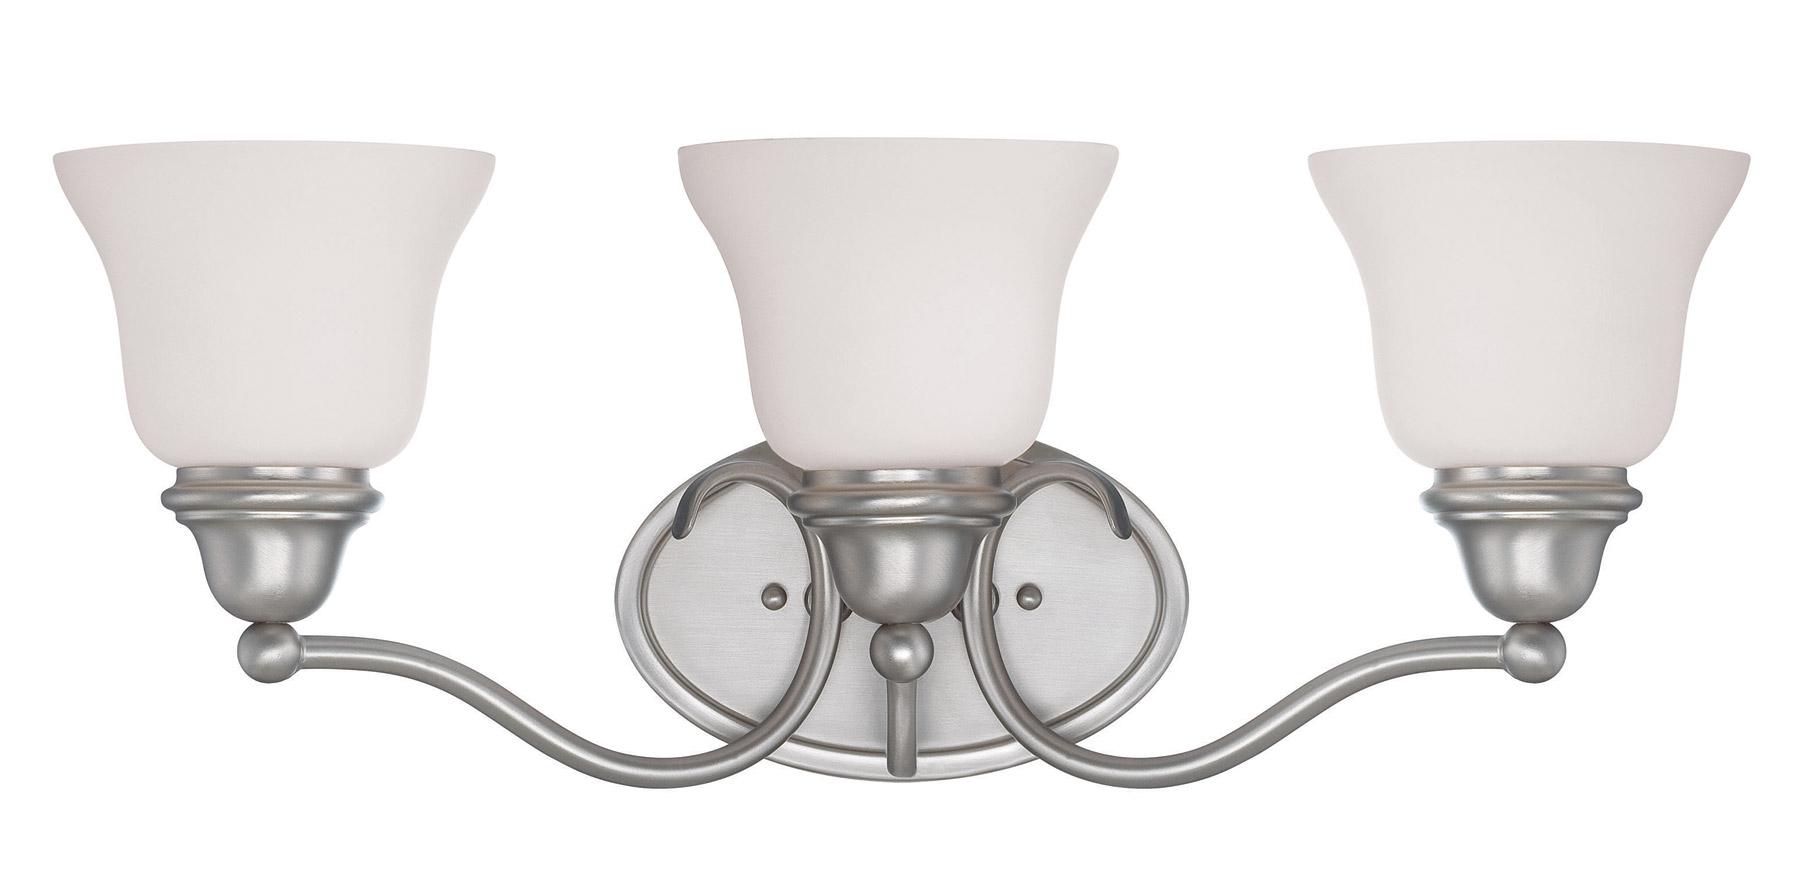 Savoy house 8 6837 3 69 yates vanity light for Savoy house bathroom lighting